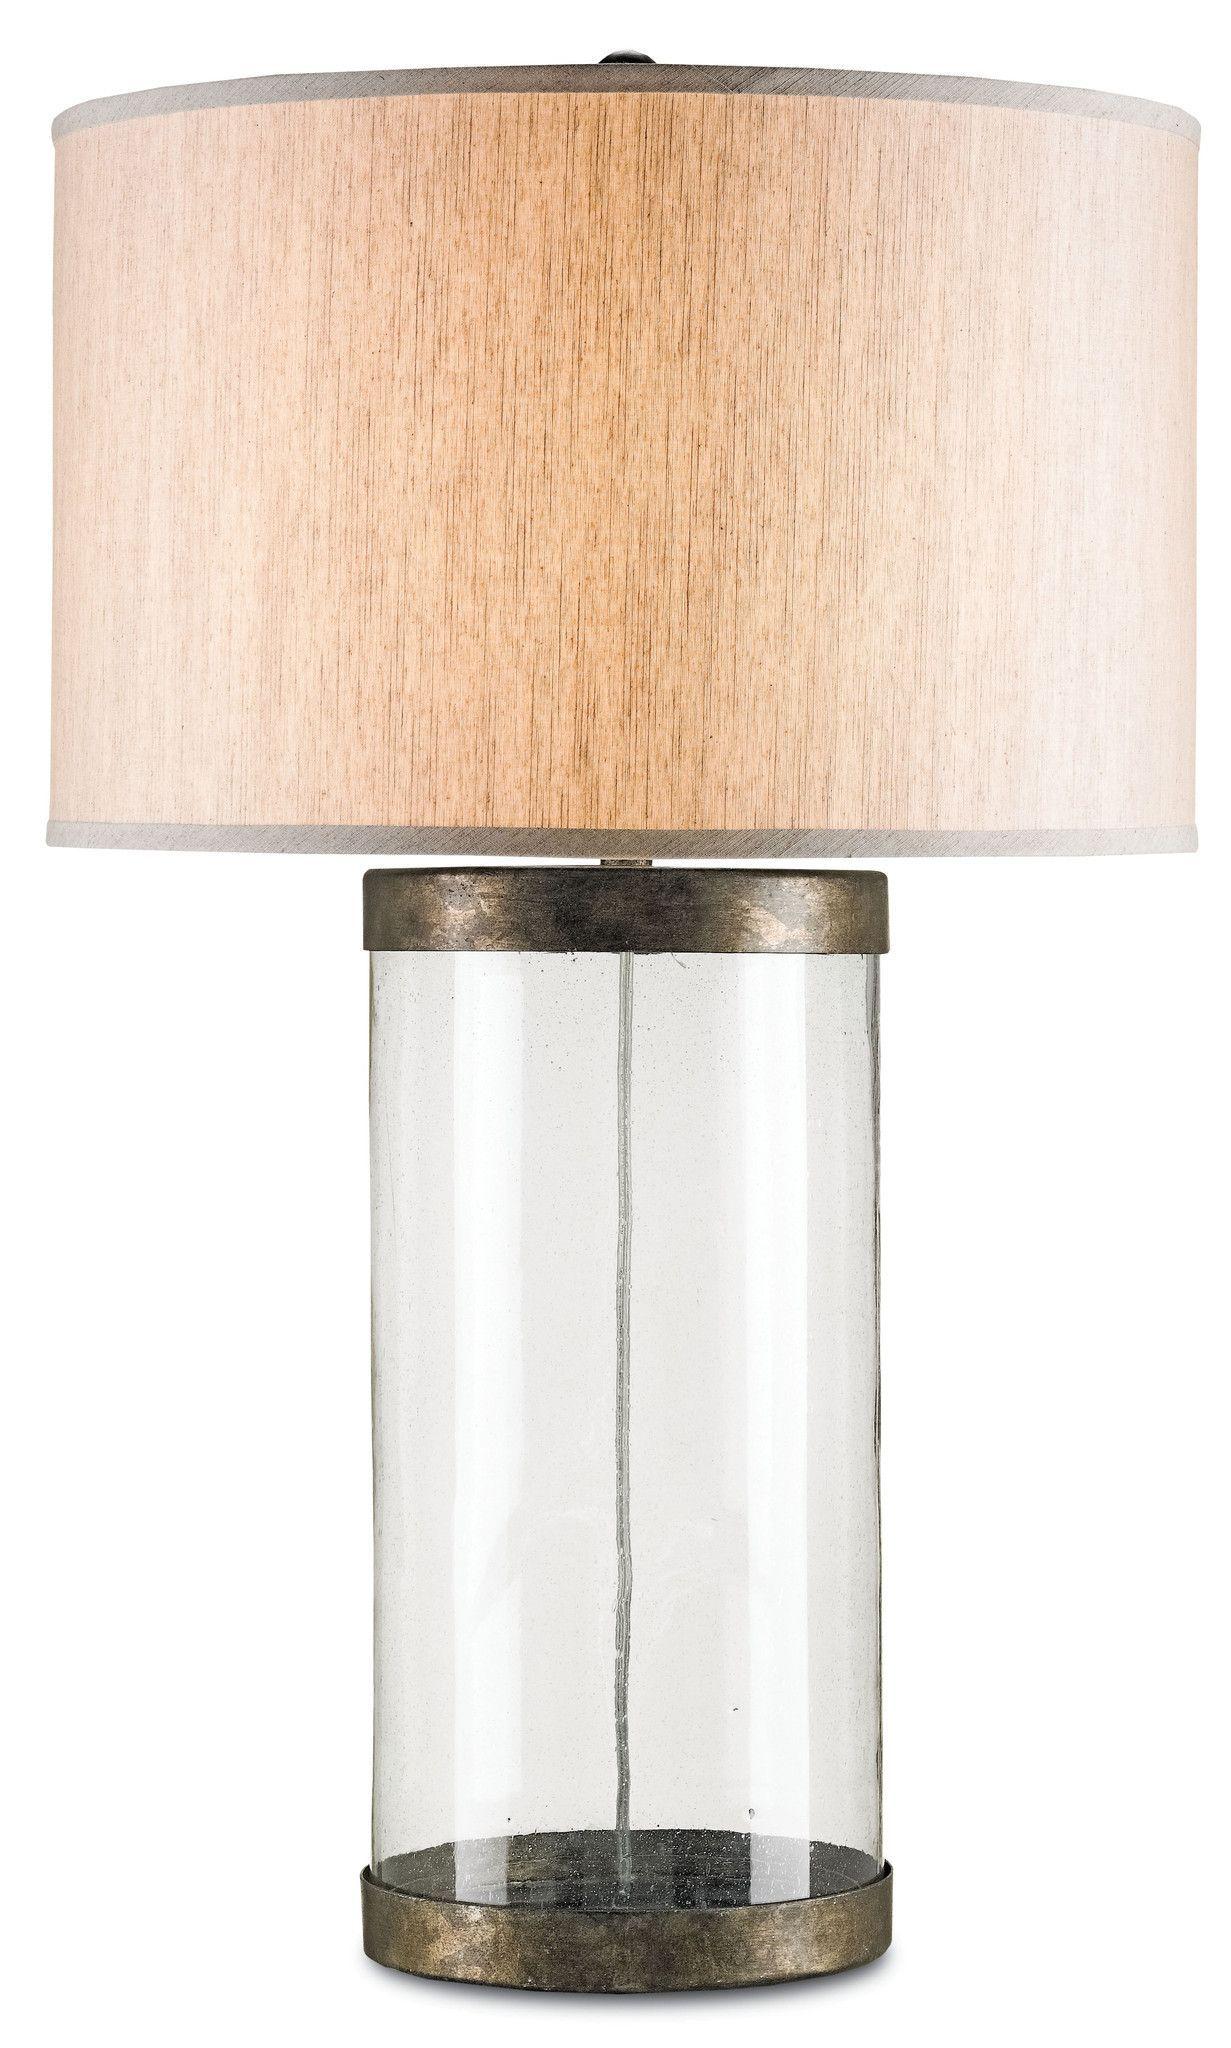 18 Transcendent Coastal Home Mobilya Ideas Glass House Table Lamp Lamp